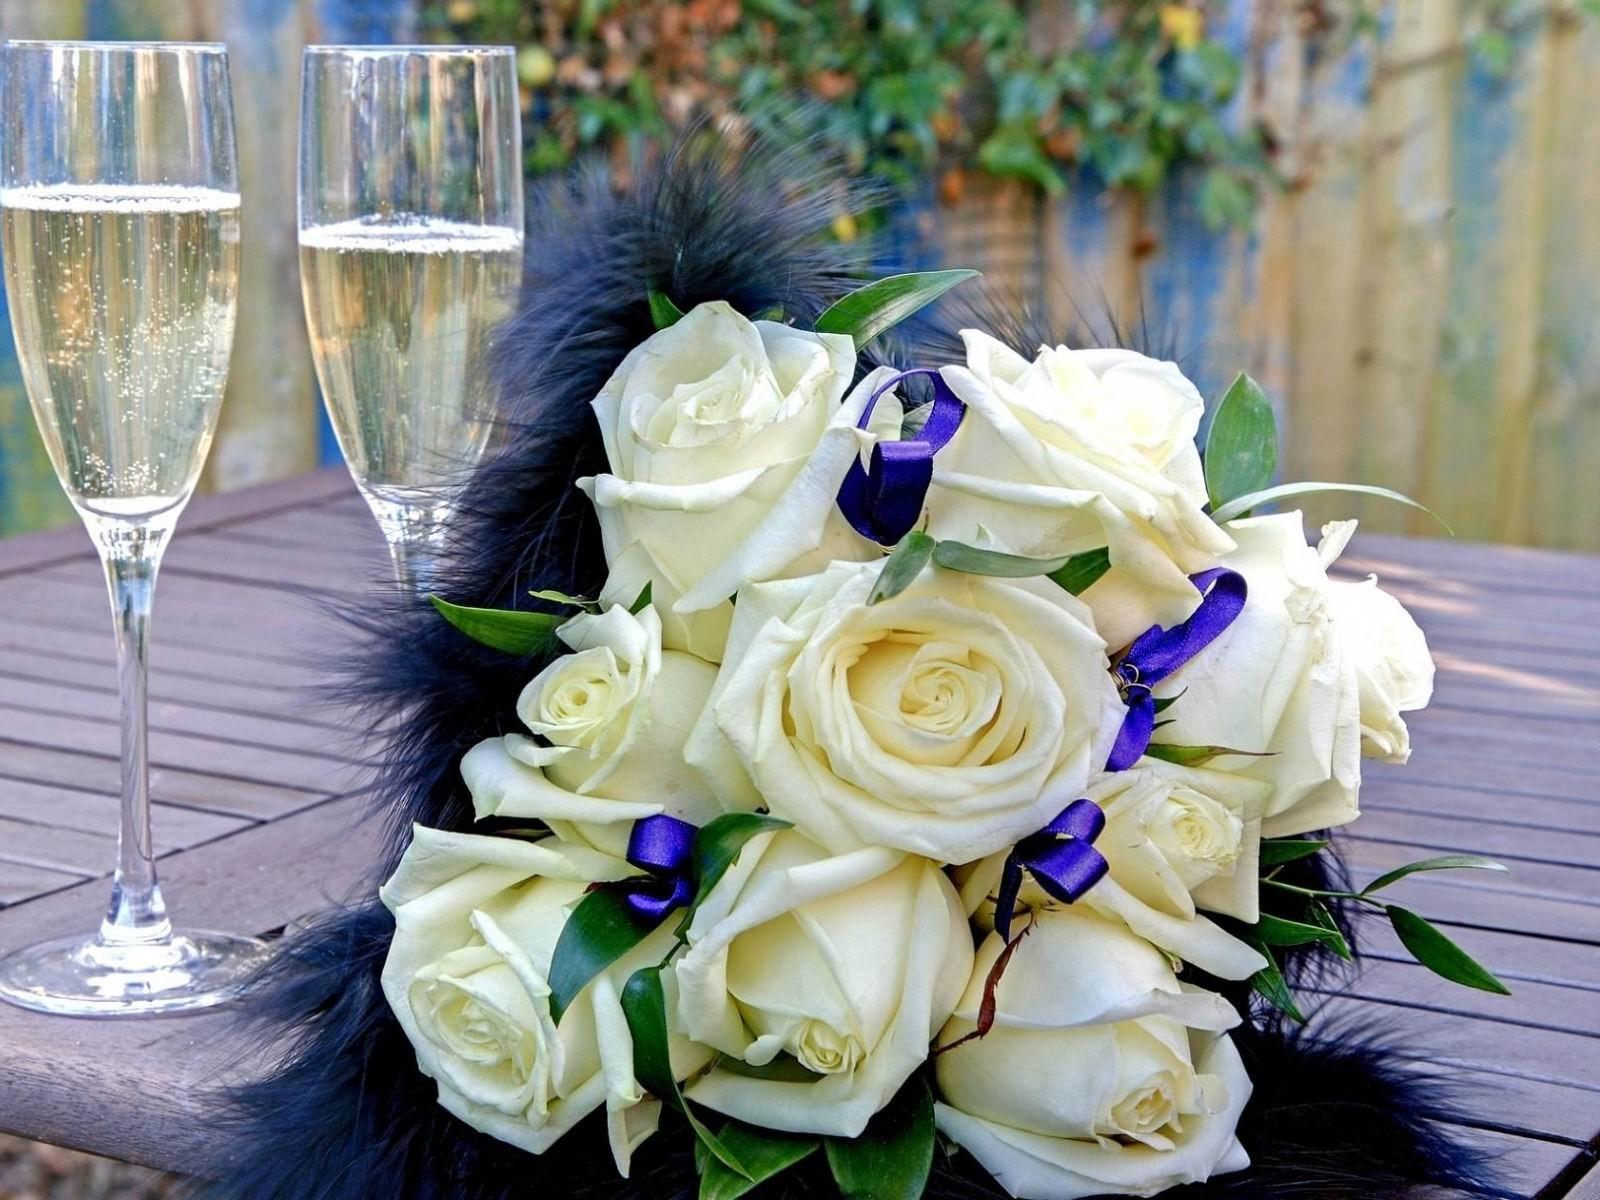 Rose Bouquet Ruban Fleurs Photographie Fond D Ecran Apercu